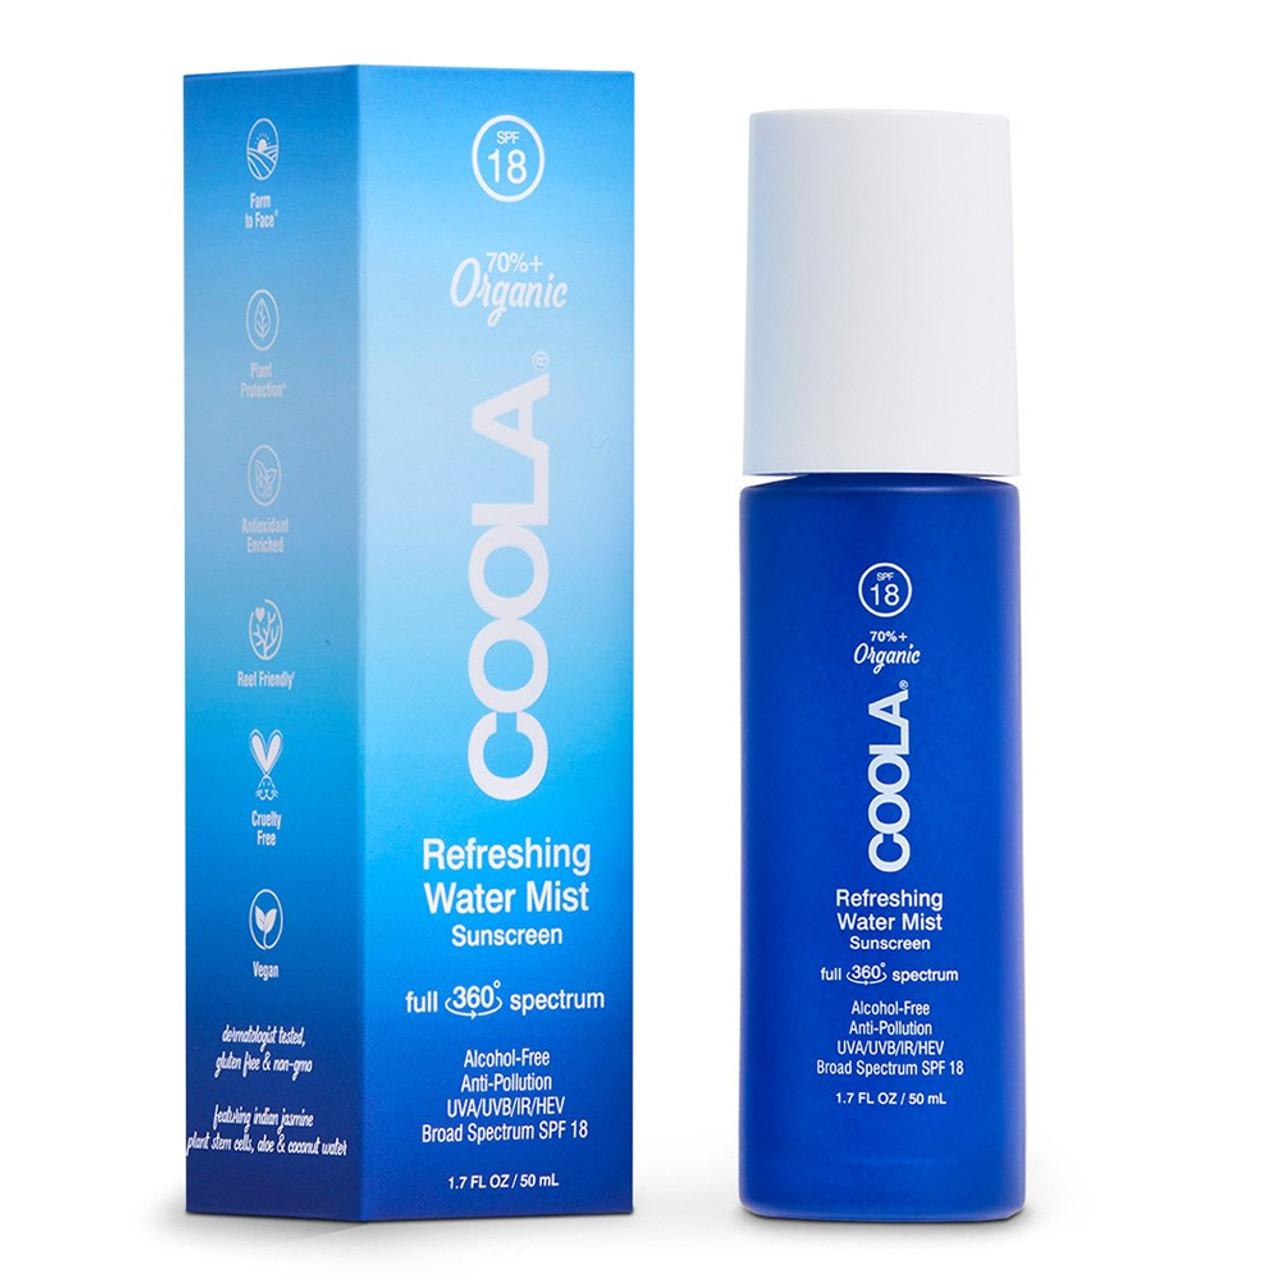 Coola Full Spectrum 360 SPF18 Refreshing Water Mist Sunscreen